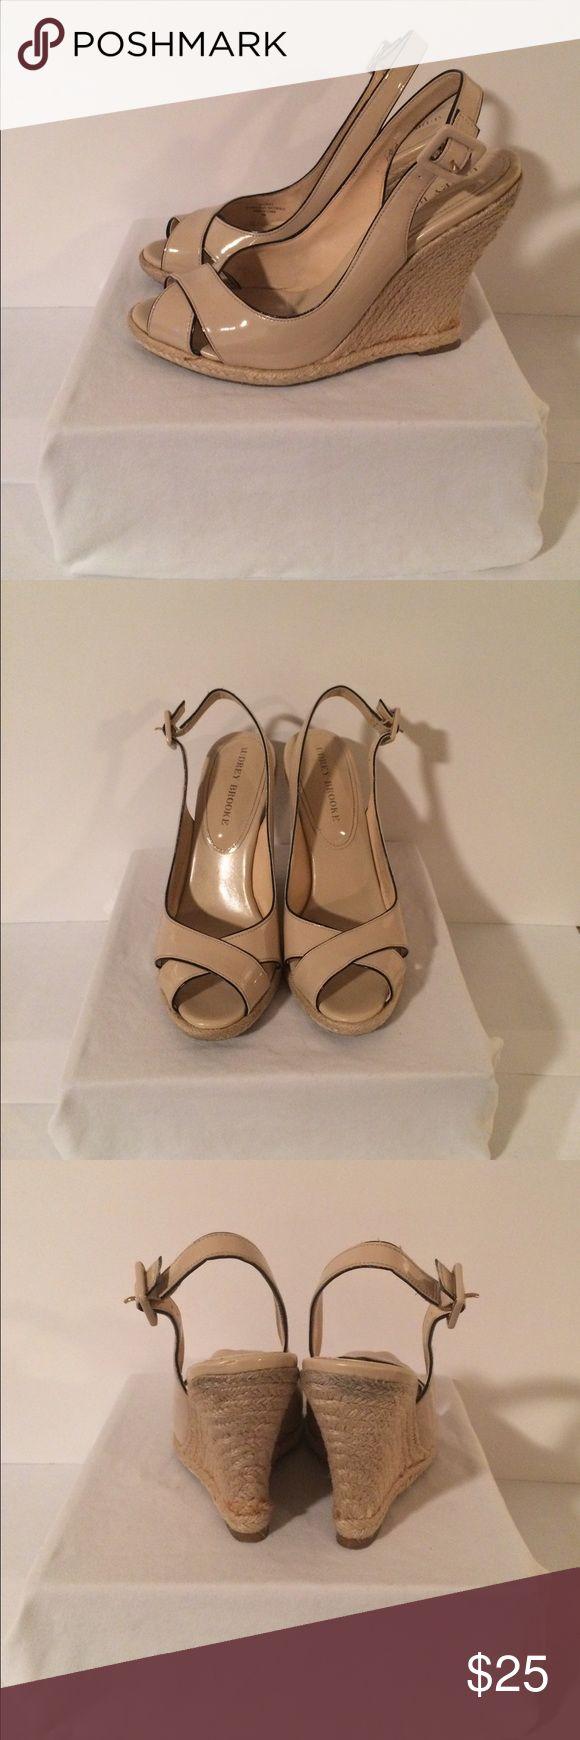 Audrey Brooke Espadrille Wedge Sandals Size 8M Audrey Brooke Creme Espadrille Wedge Sandals Size 8M Audrey Brooke Shoes Sandals